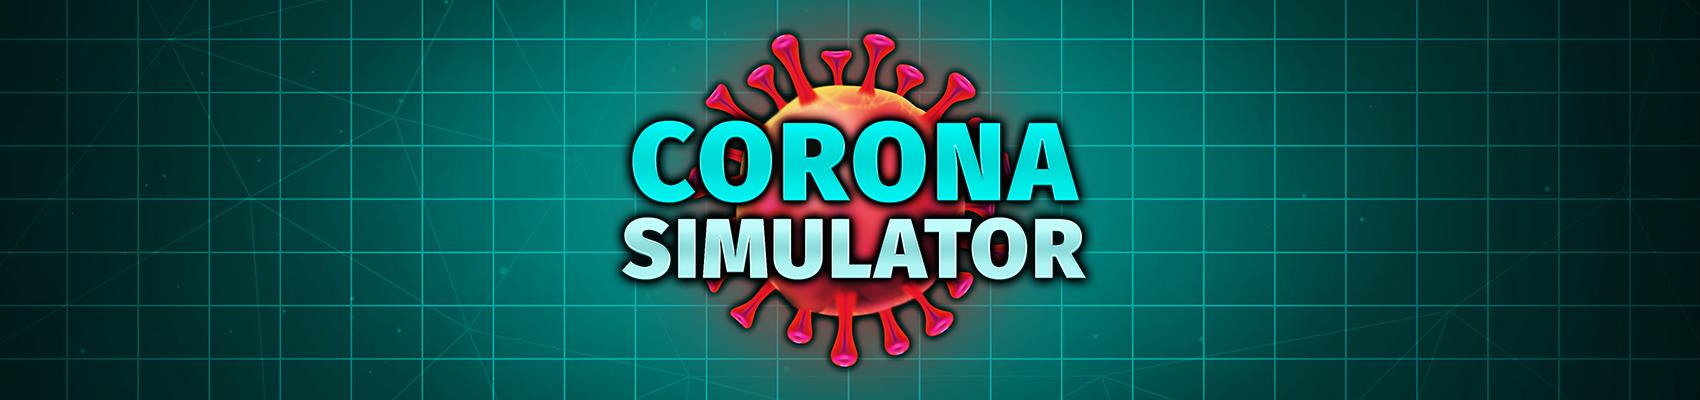 Corona Simulator